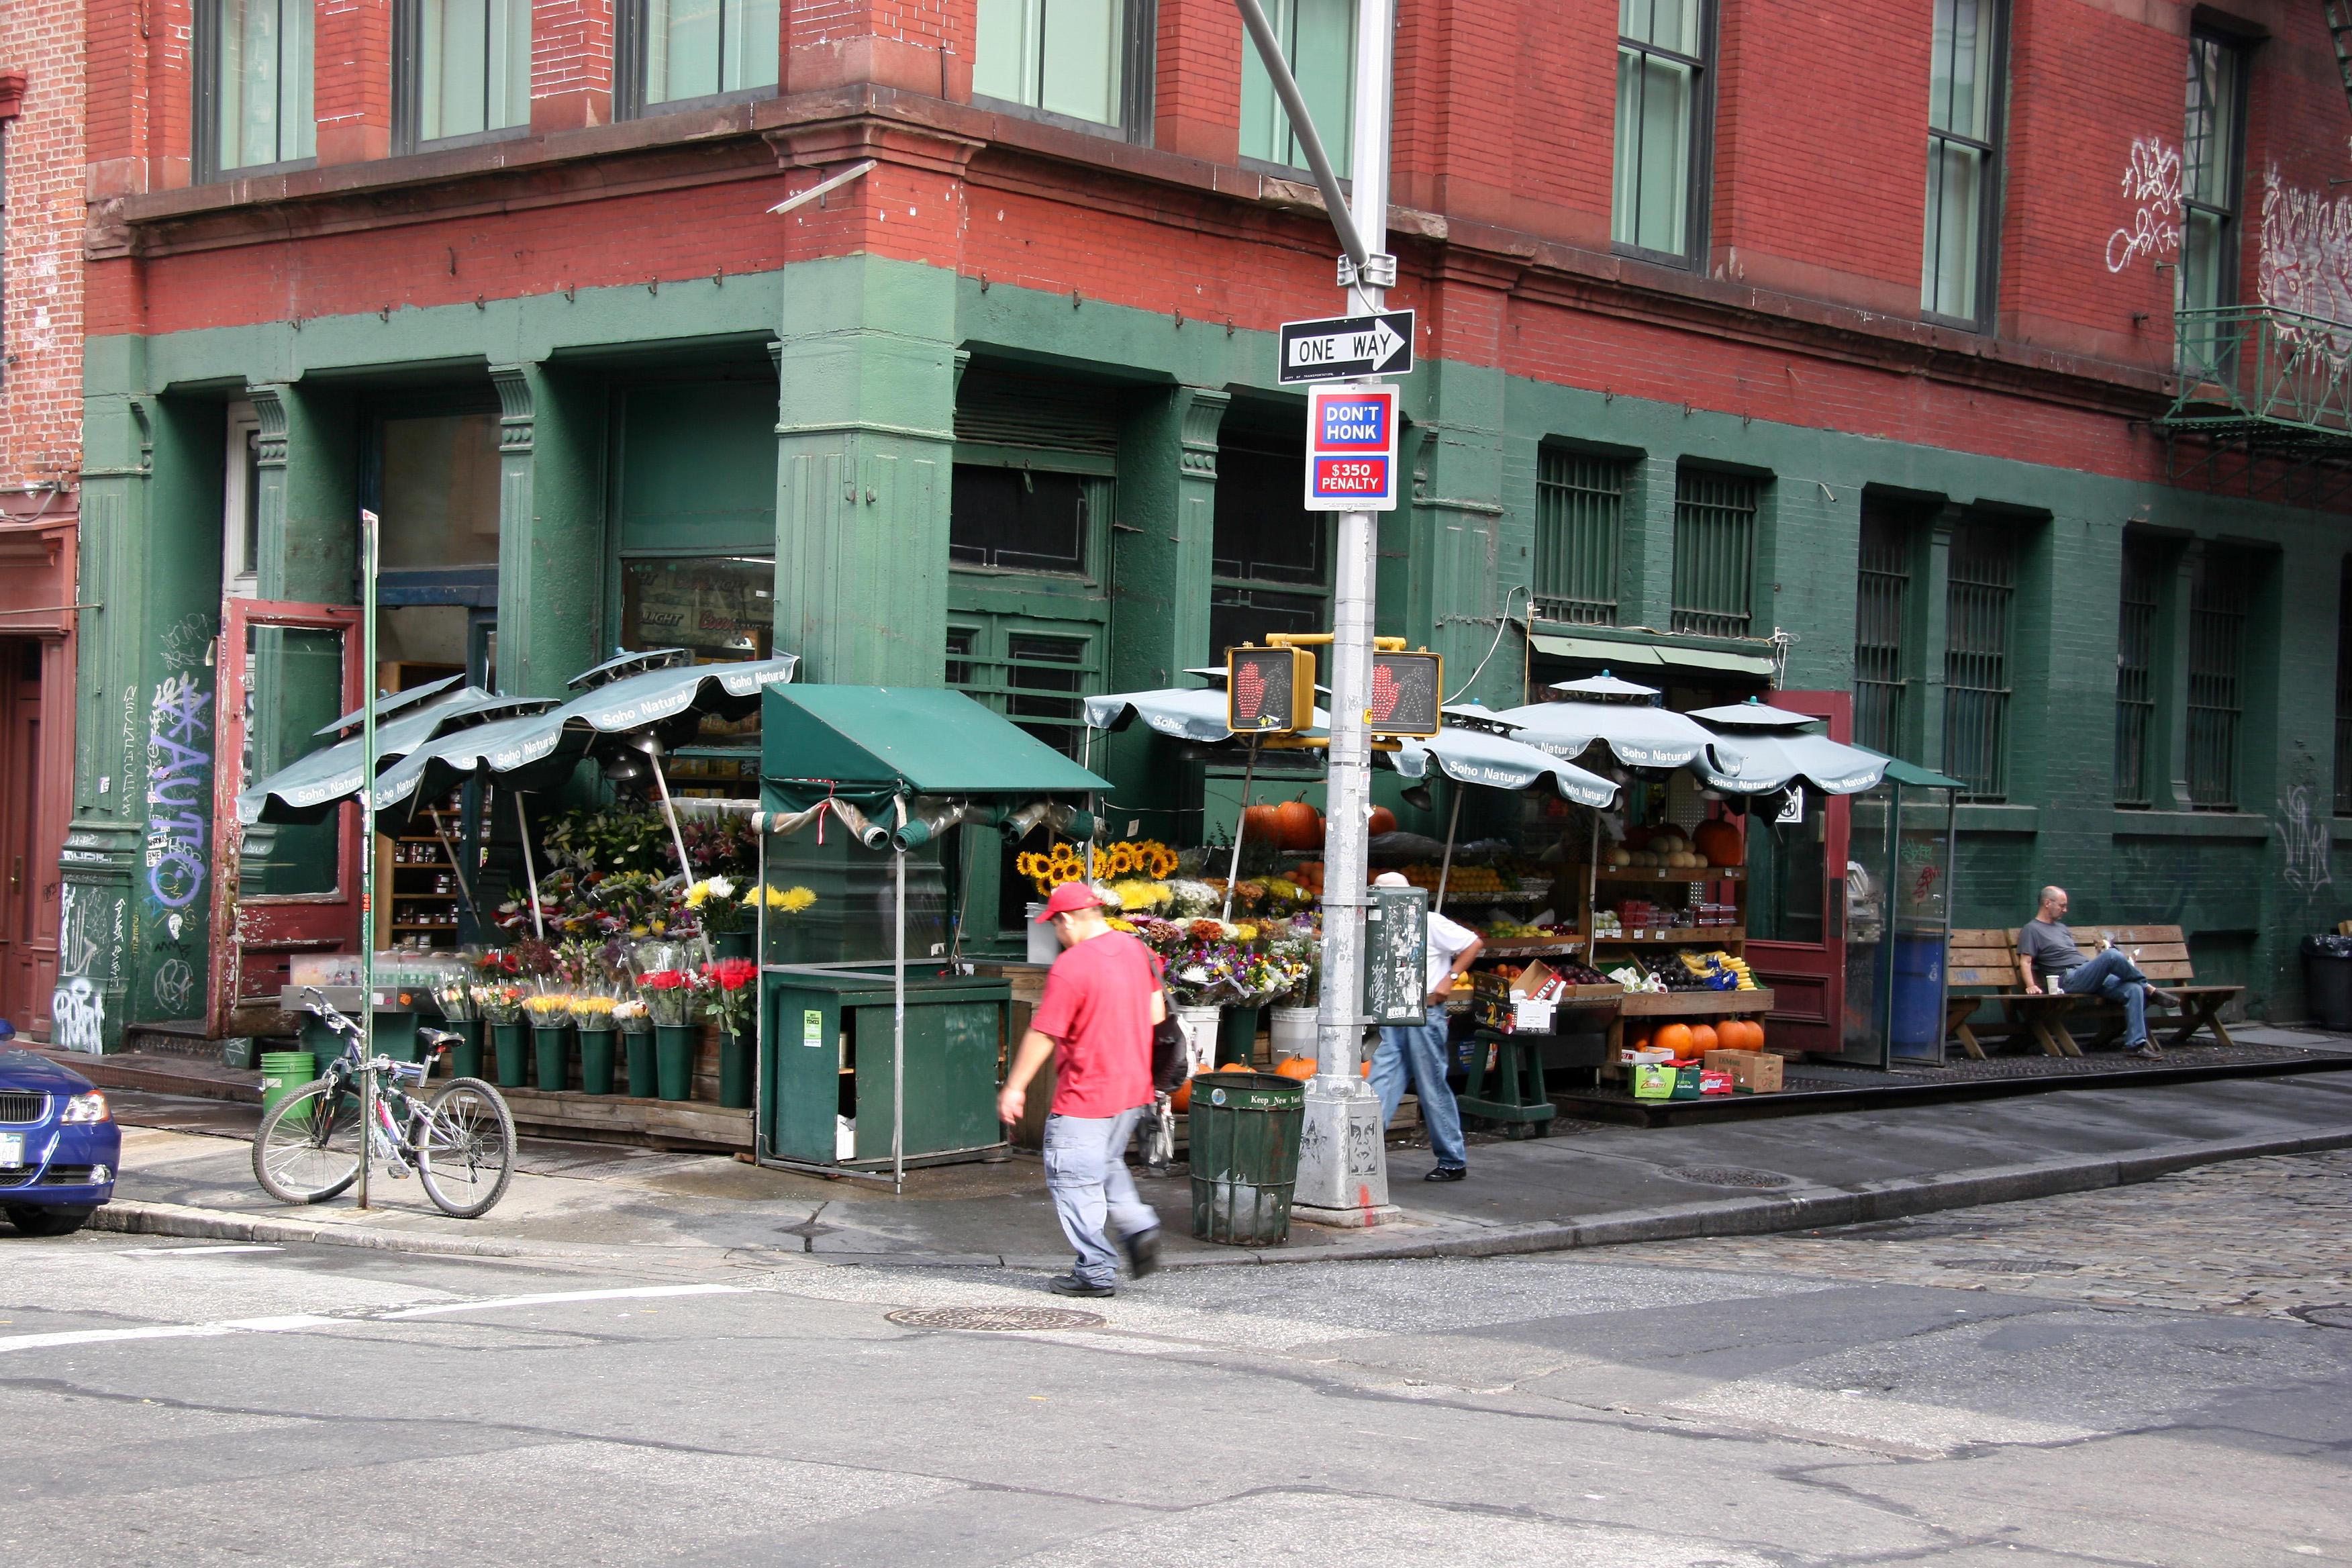 Market at Mercer Street